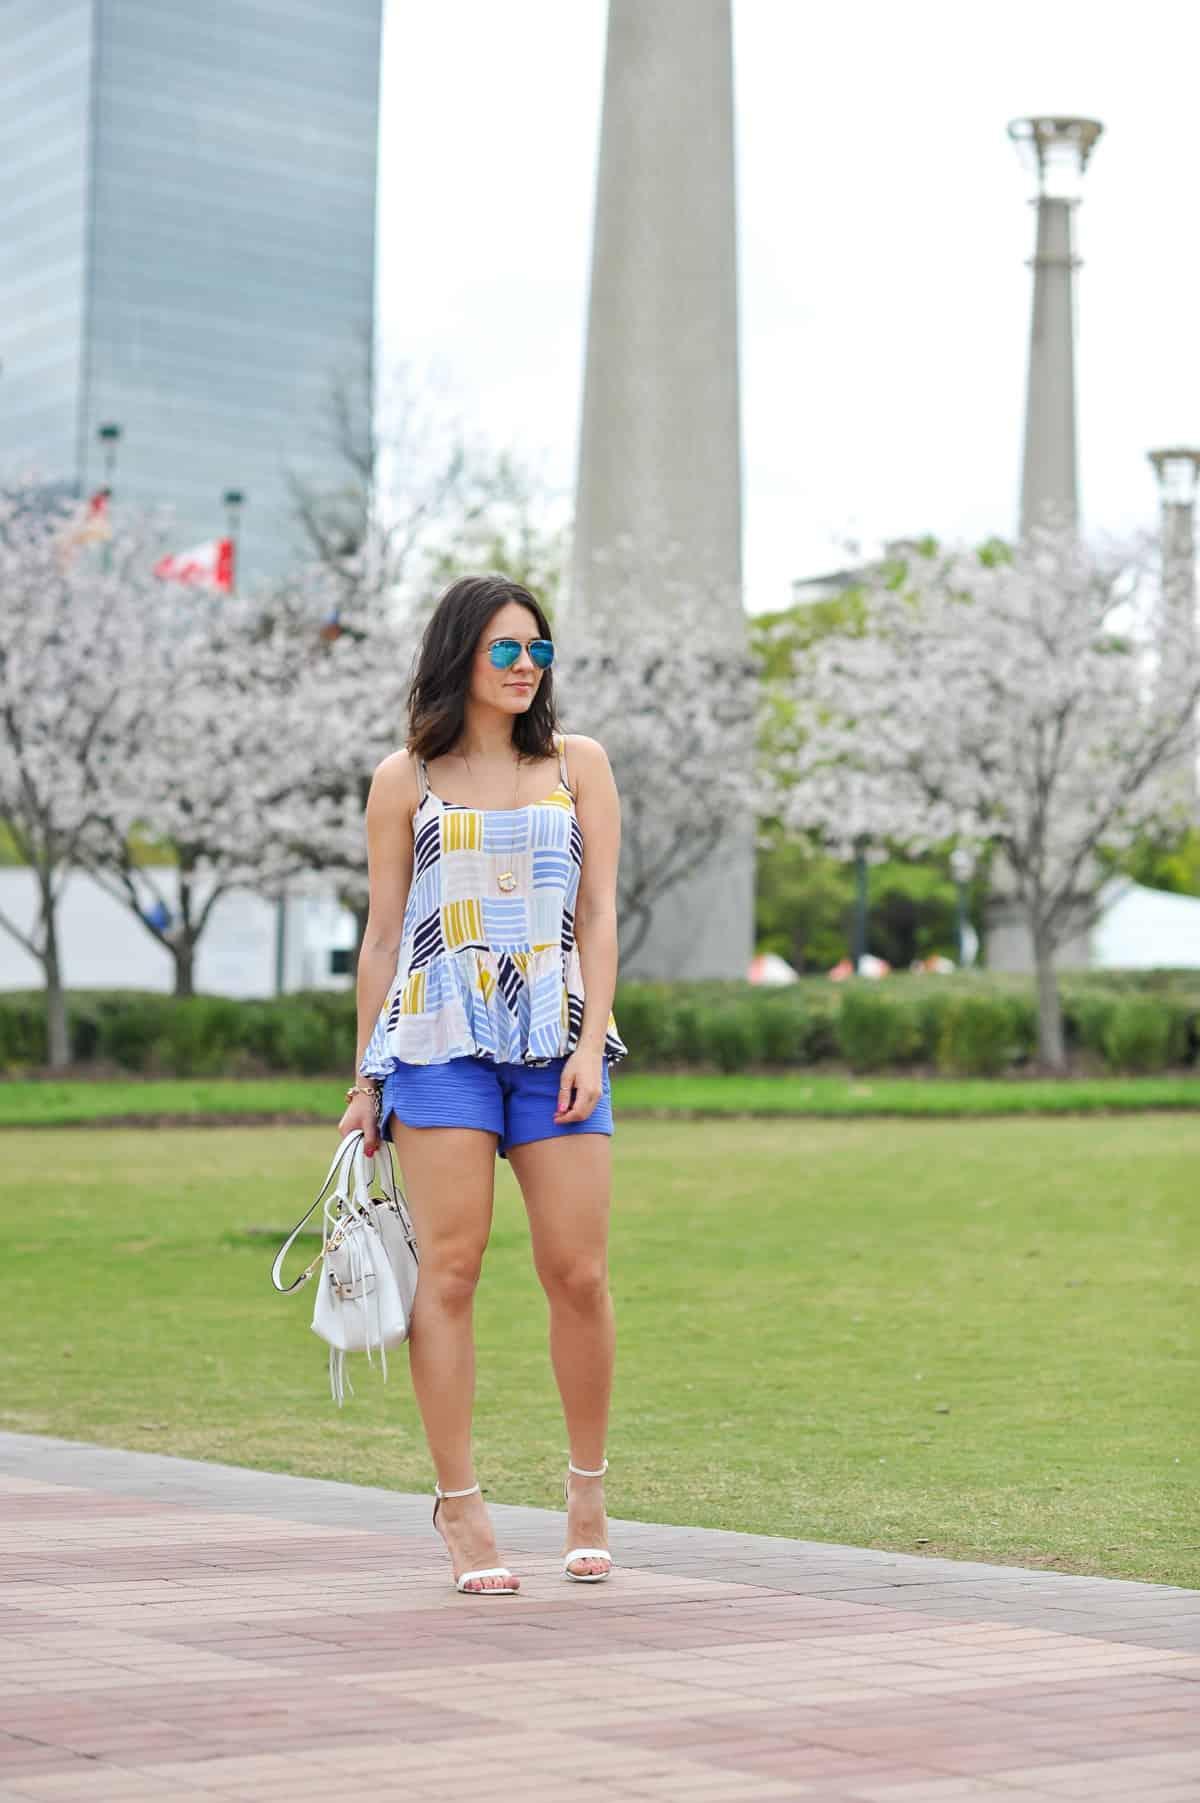 Old Navy printed peplum tank - summer outfit ideas - My Style Vita - @mystylevita - 10